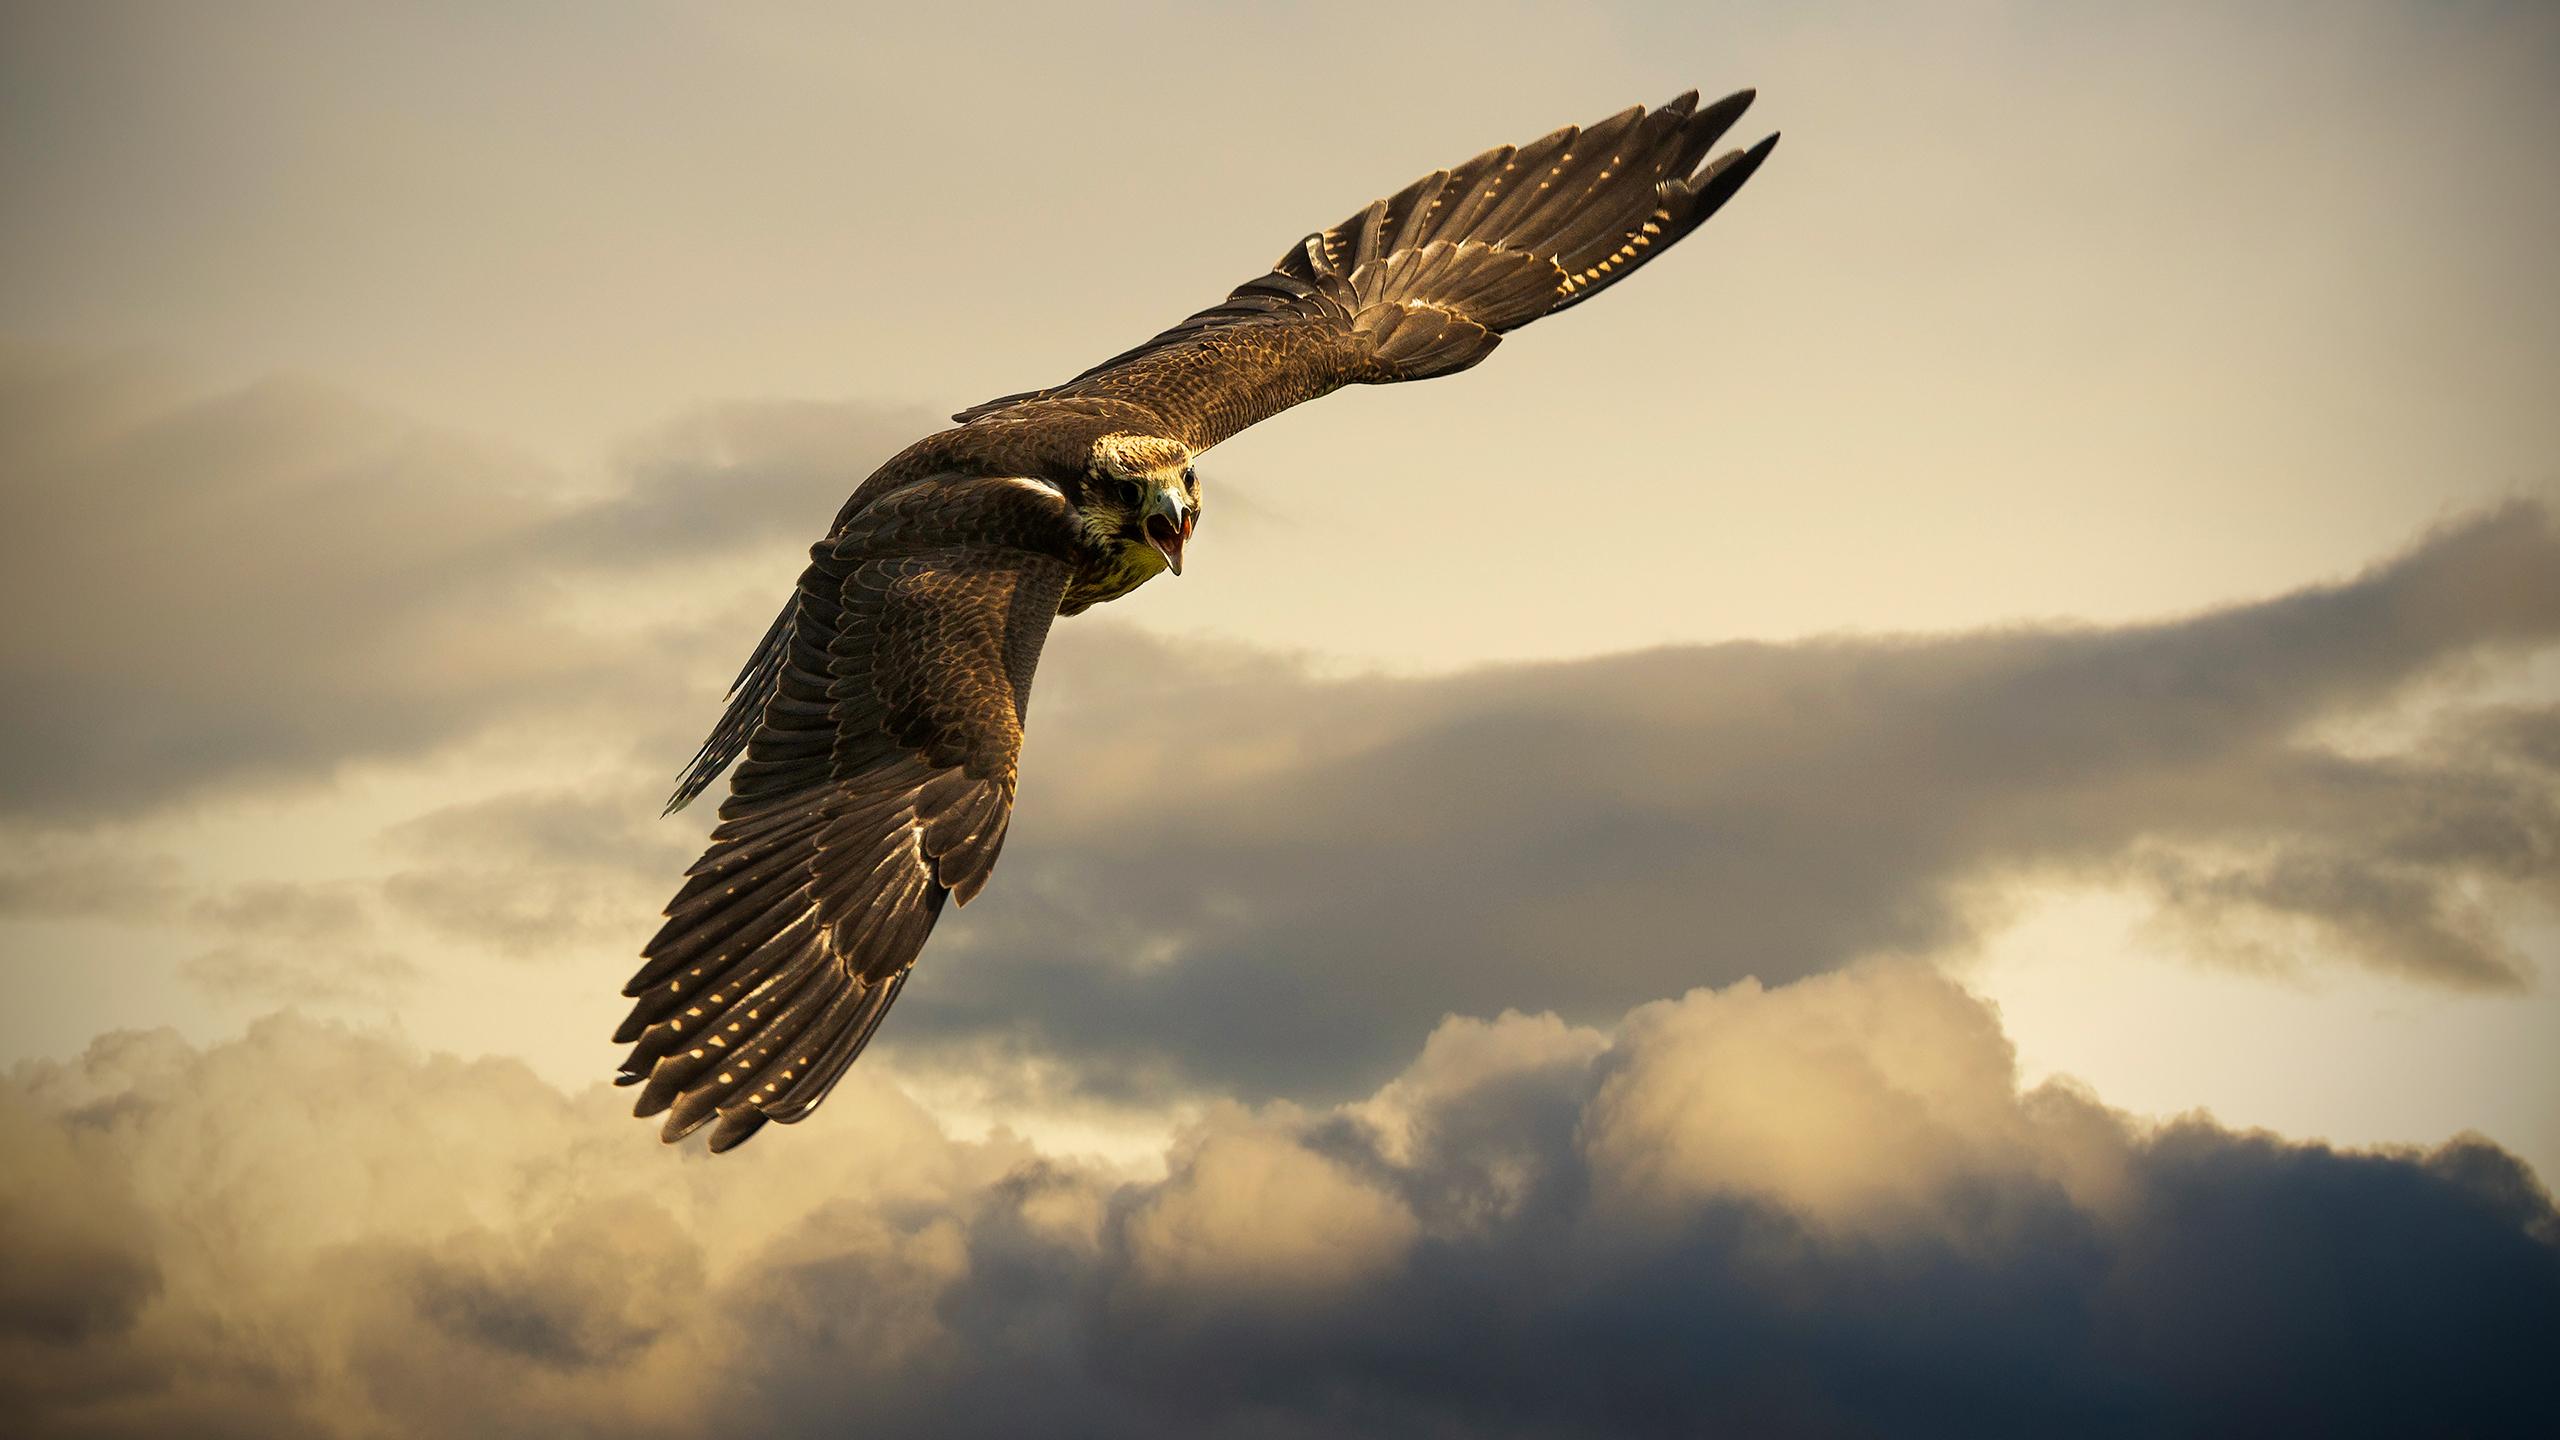 angry_bird_wallpaper_2560x1440